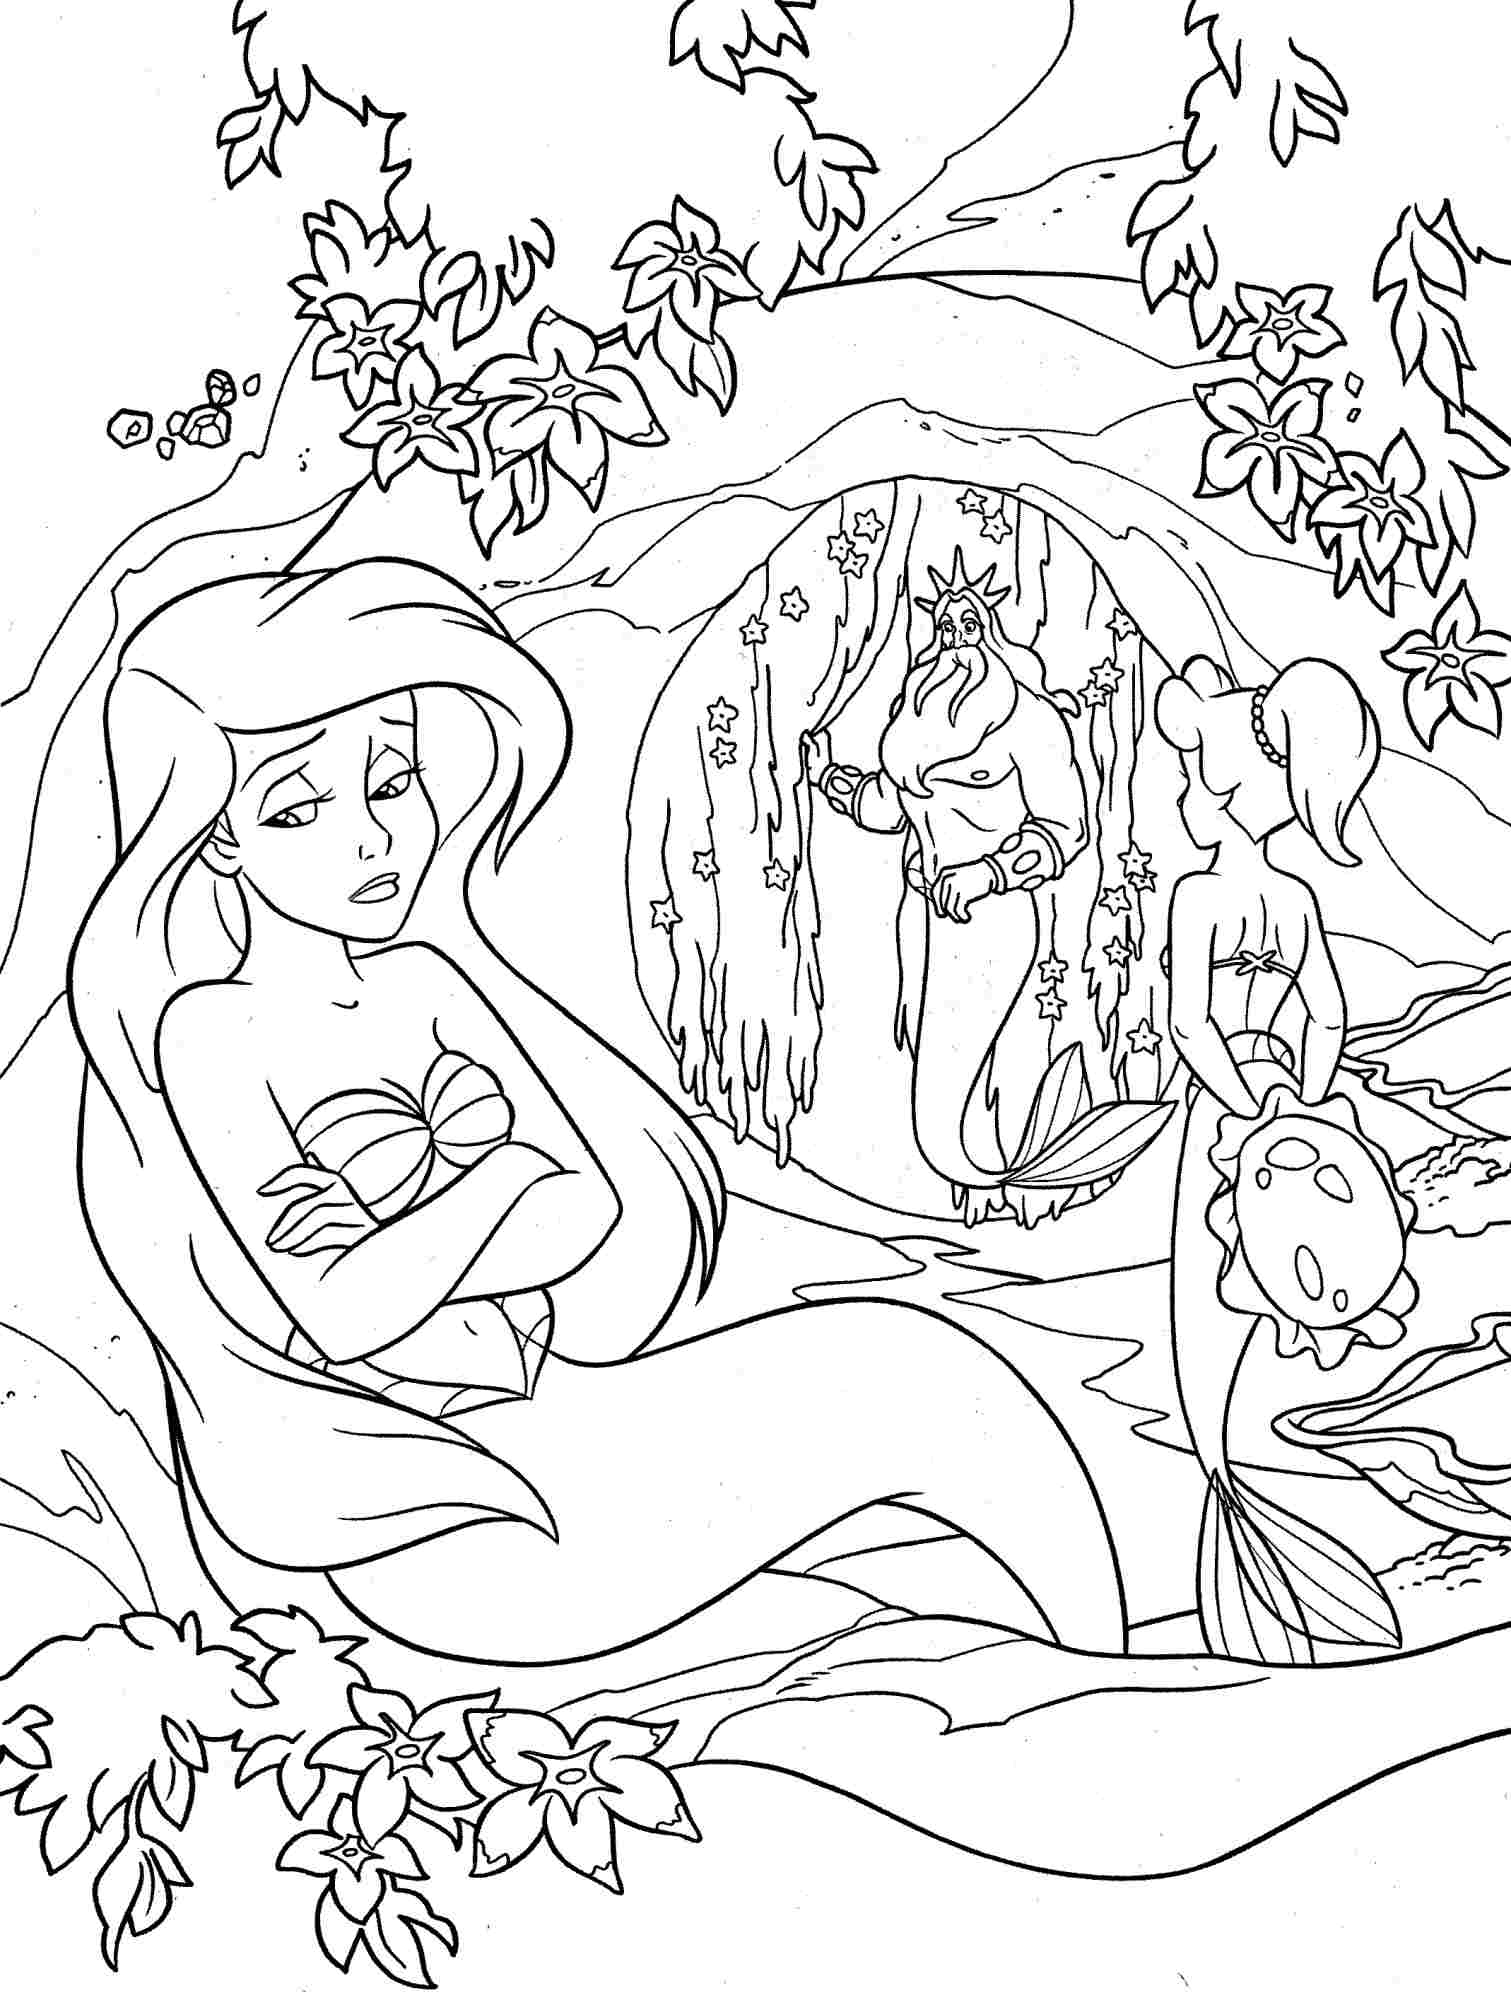 Disney Little Mermaid Coloring Pages at GetDrawings.com ...